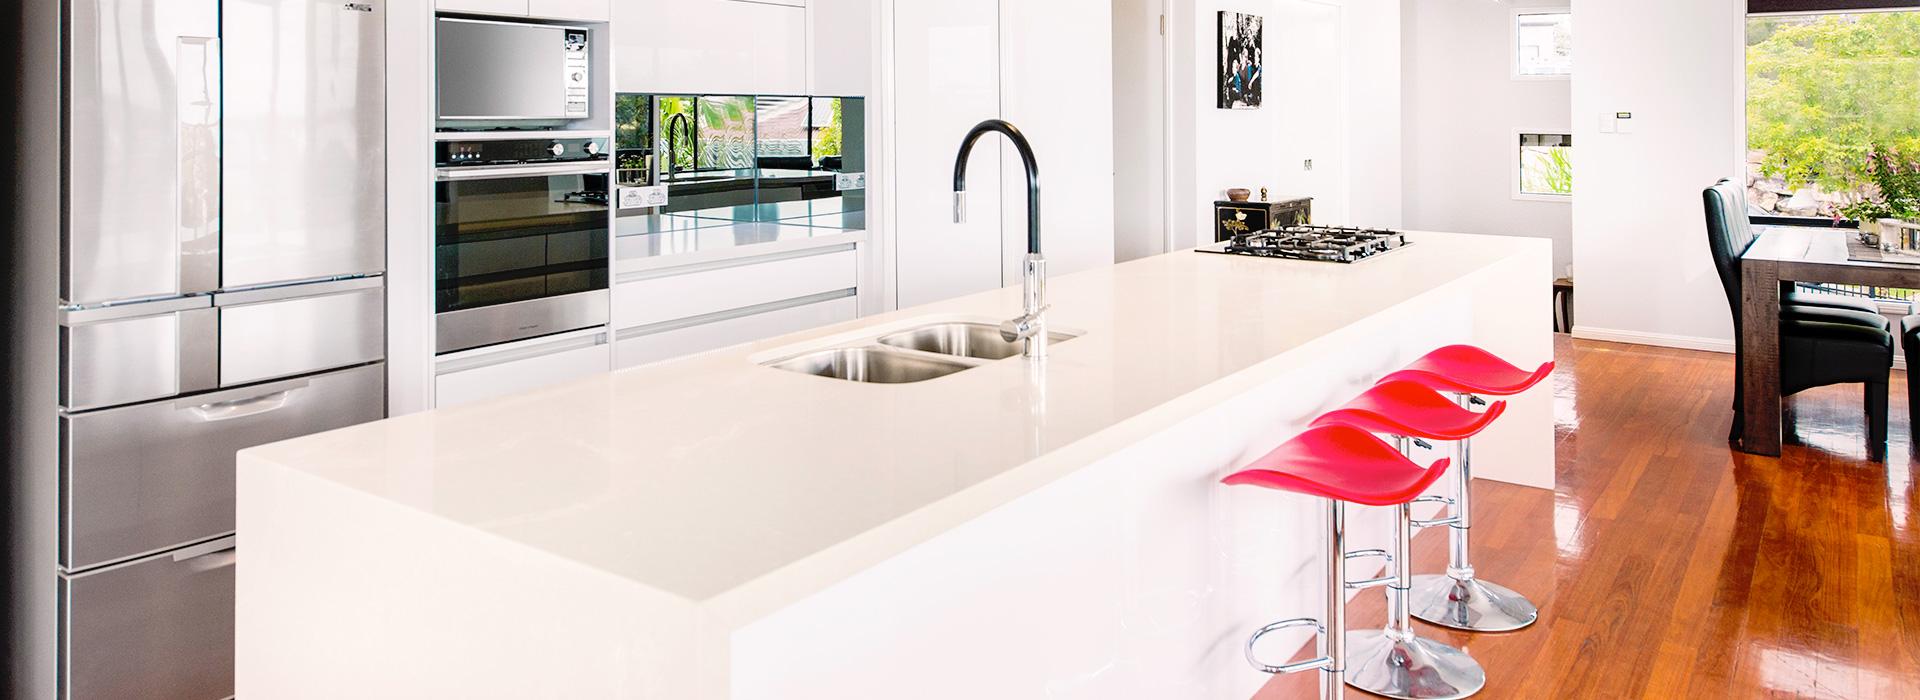 Kitchen Renovations and Wardrobe Design | Wallspan Adelaide